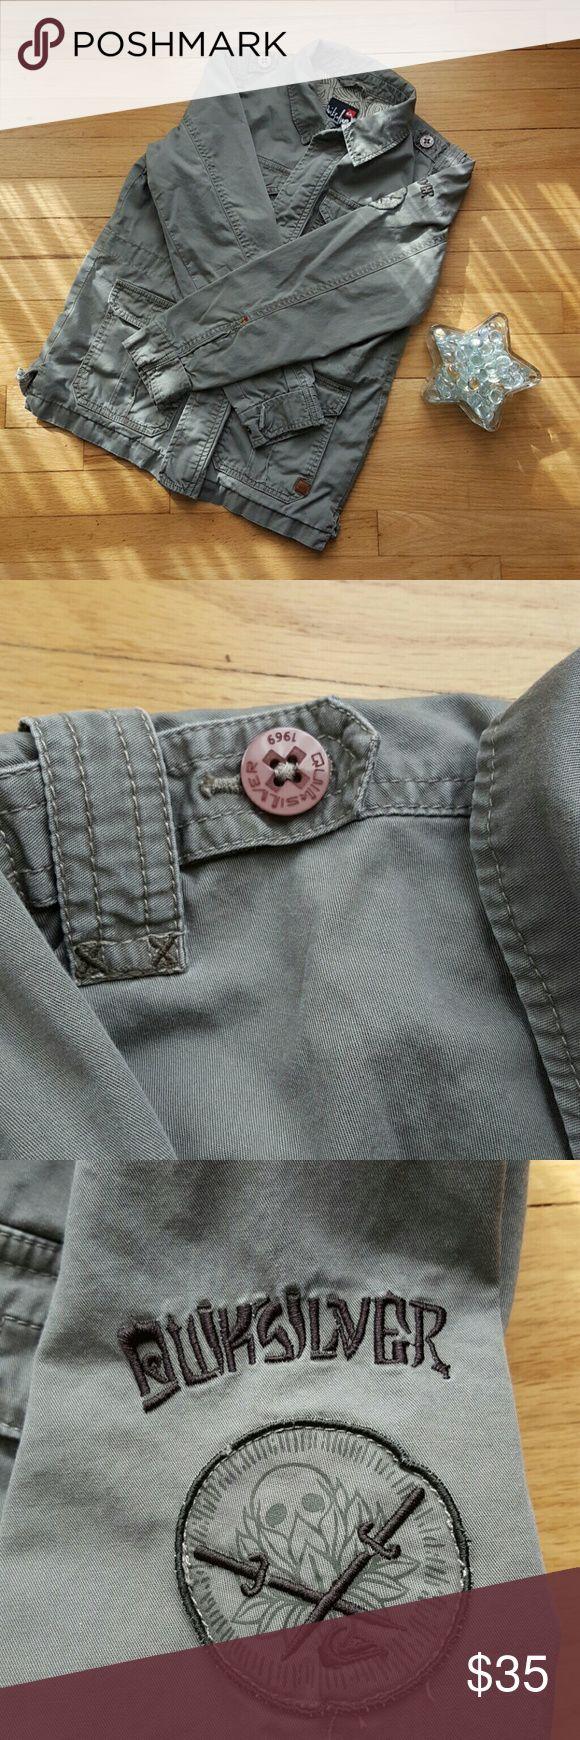 Quiksilver Women's Military Style Jacket Quiksilver Women's Military Style Jacket! 100% Cotton. No flaws! Excellent condition! Size Medium. Quiksilver Jackets & Coats